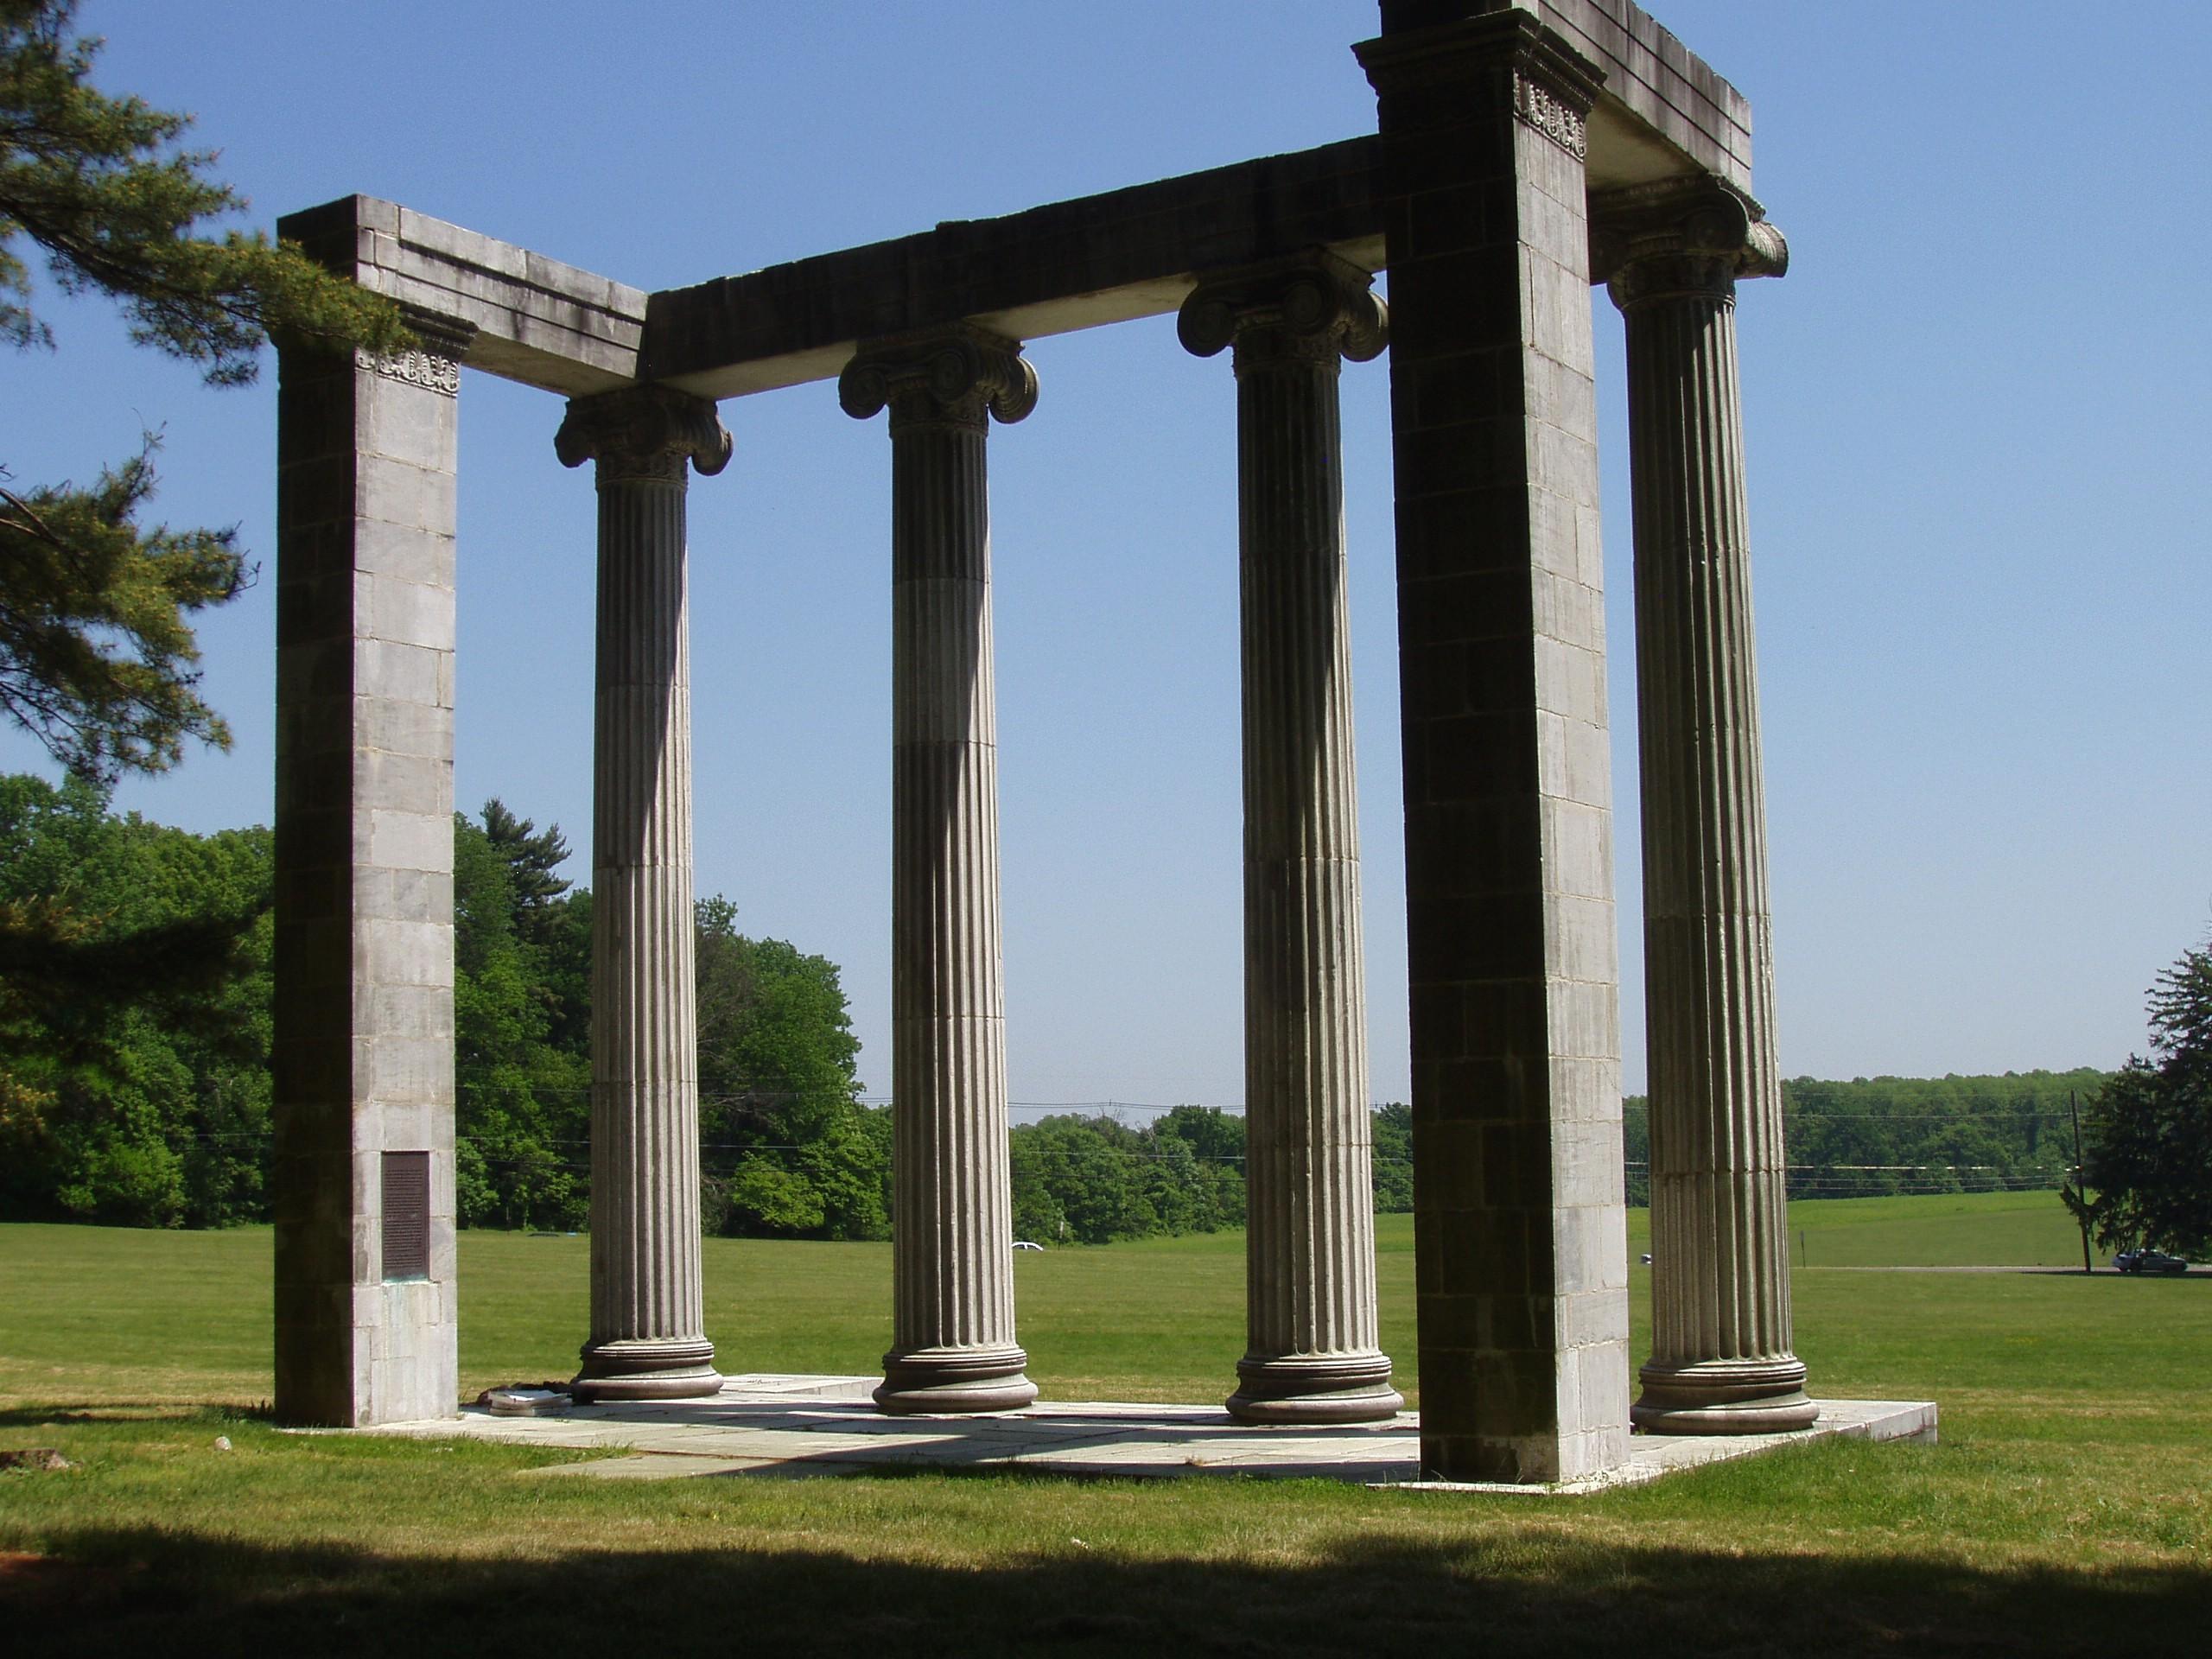 Princeton_Battlefield_State_Park_(Princeton,_NJ)